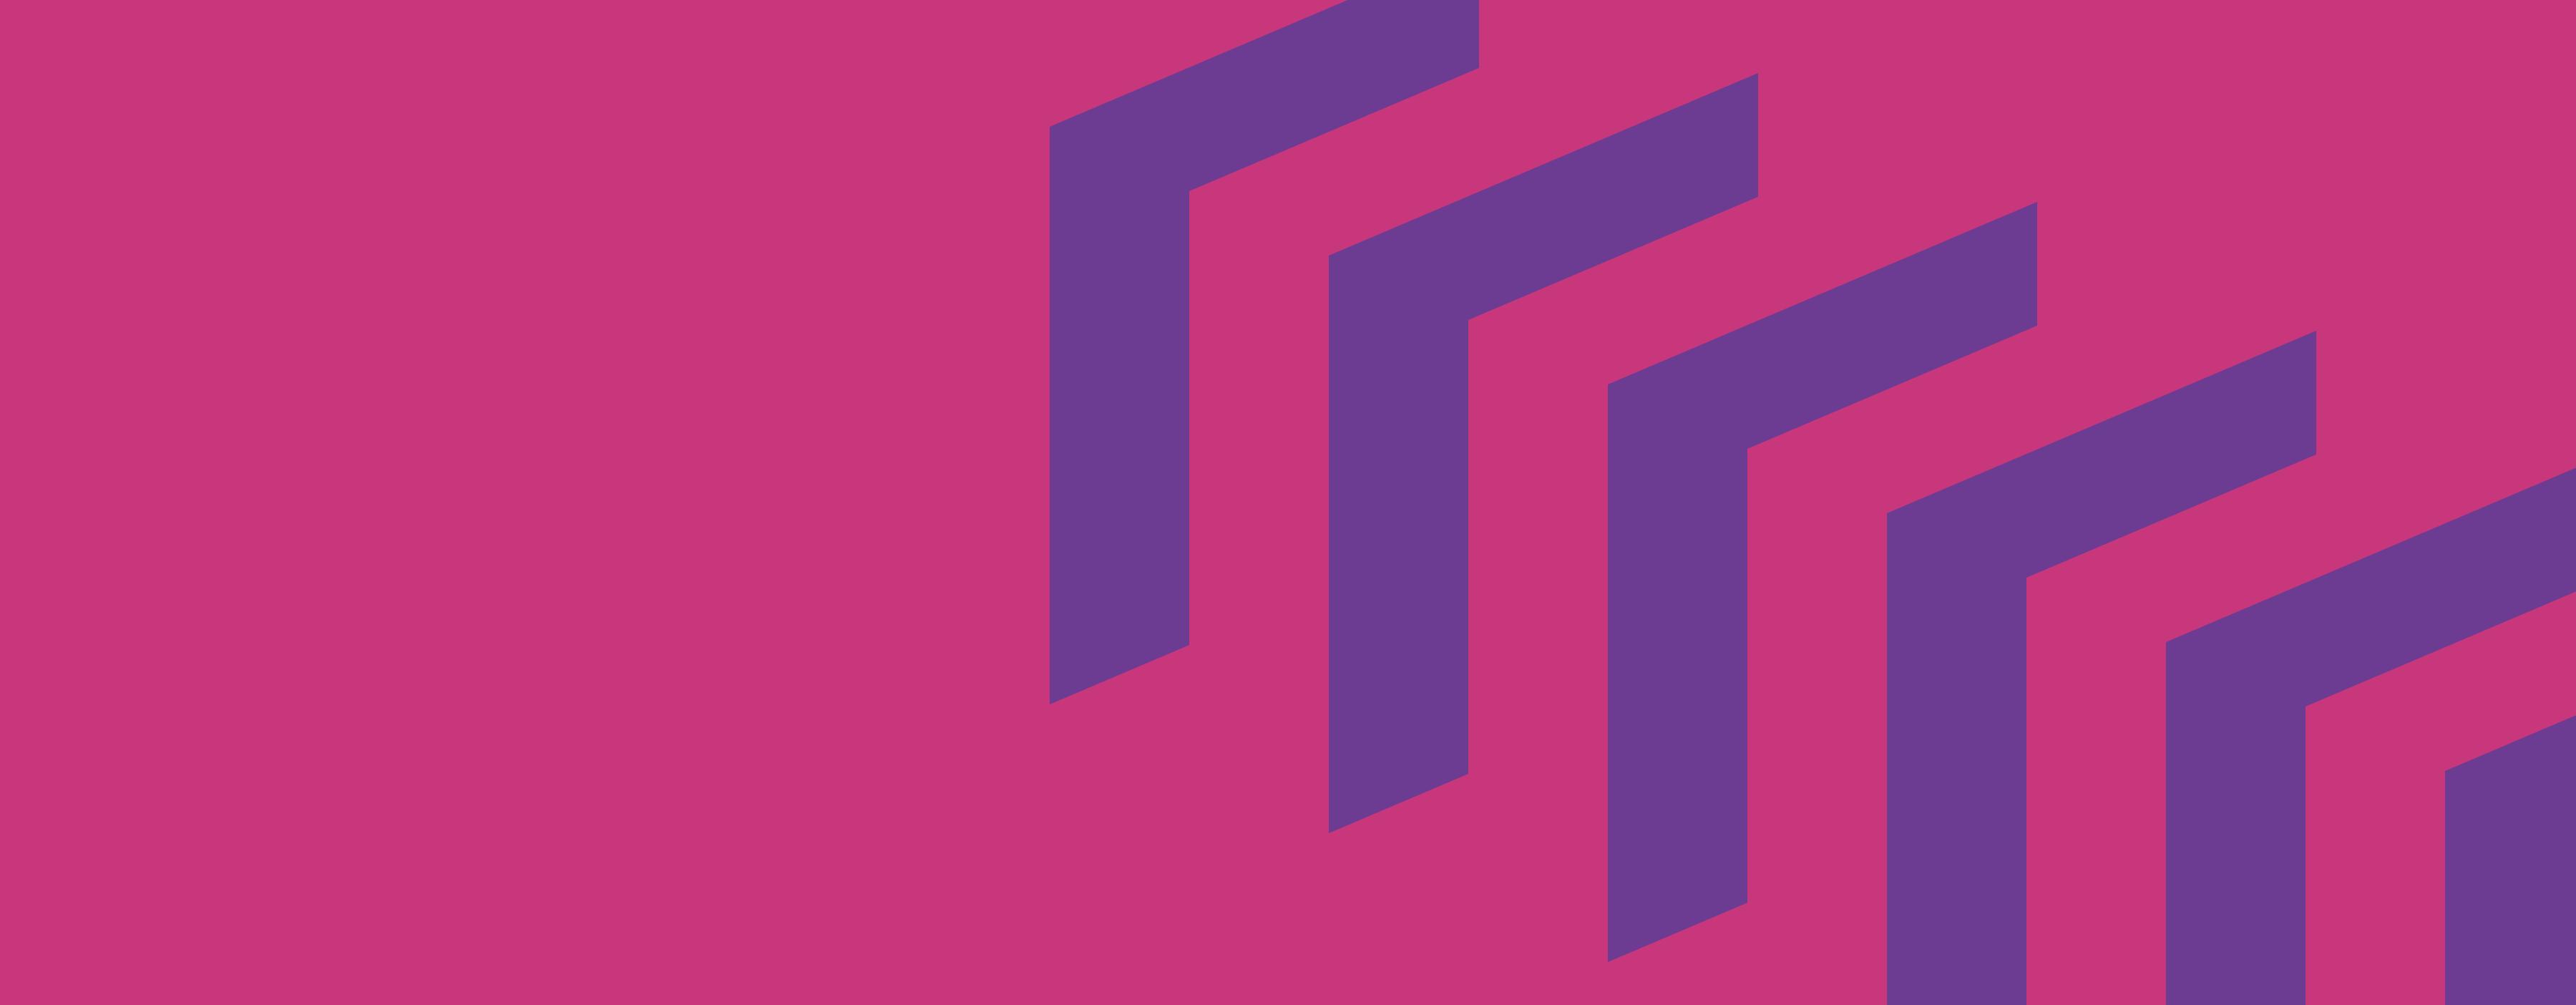 A decorative pattern of arrows